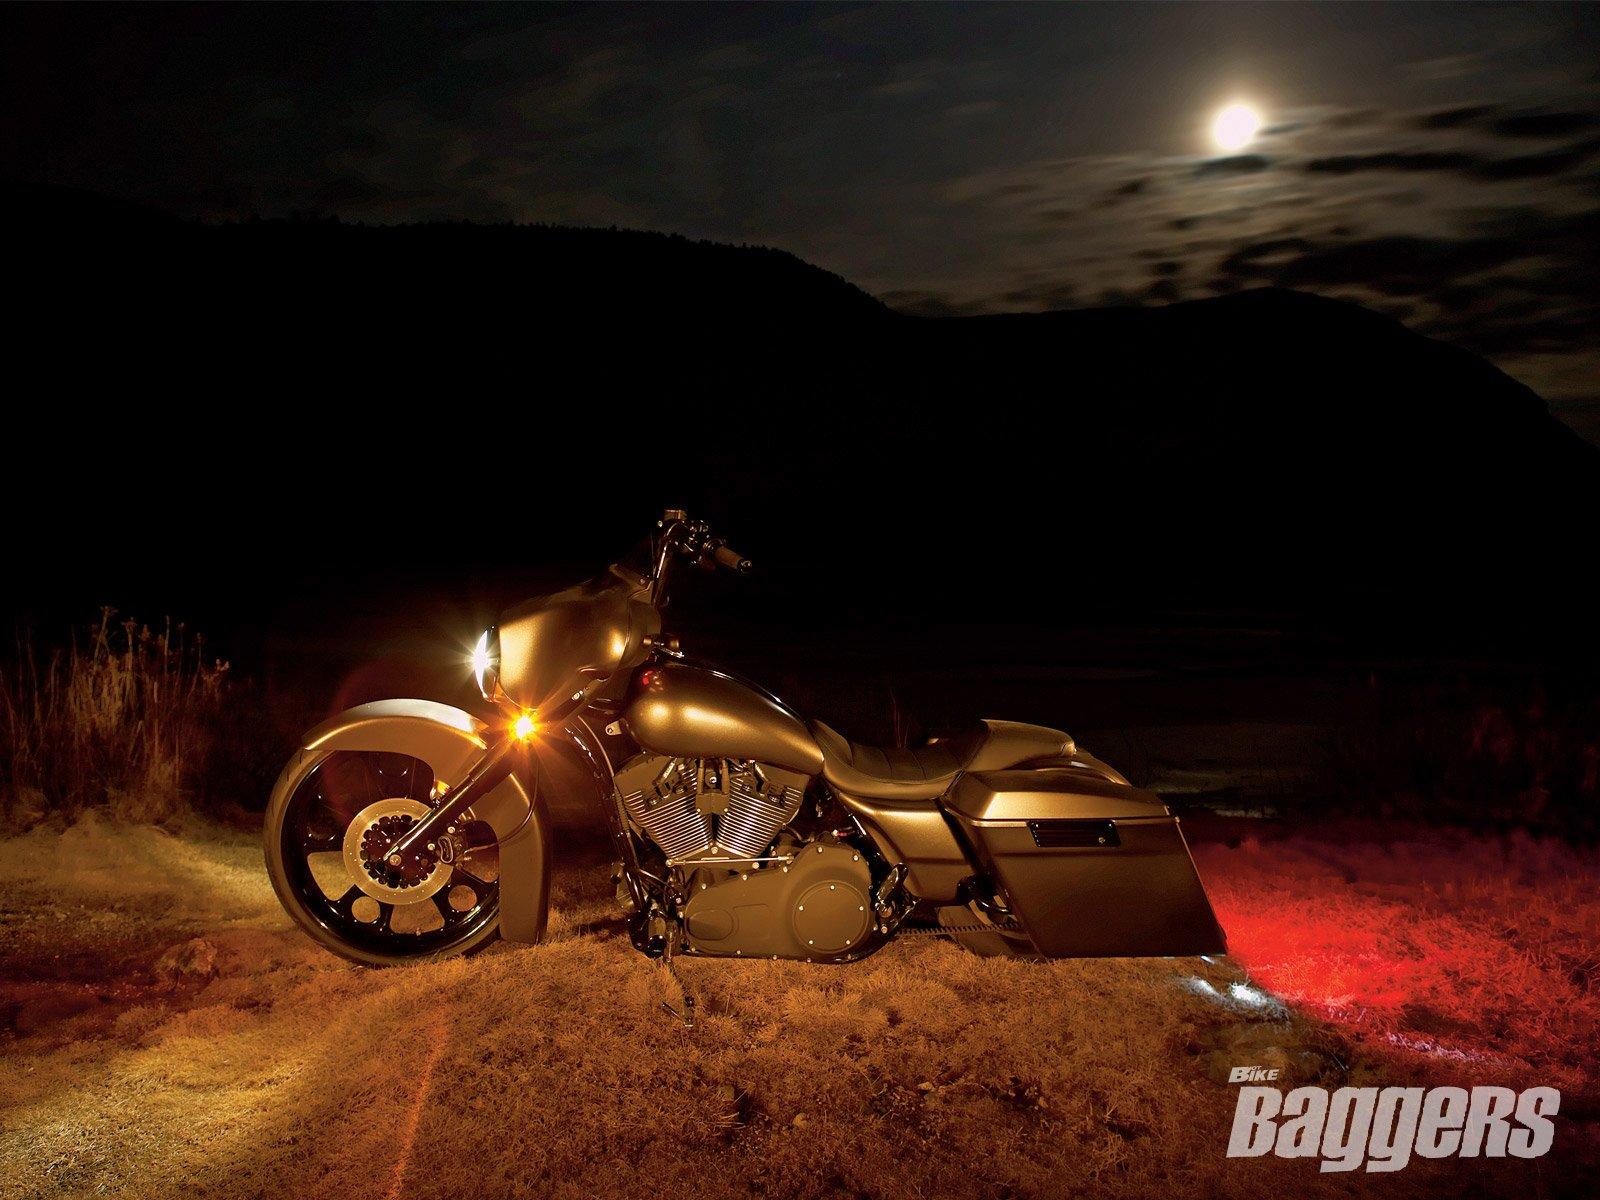 1 2007 Harley Davidson Chopped Street Glide Hd Wallpapers